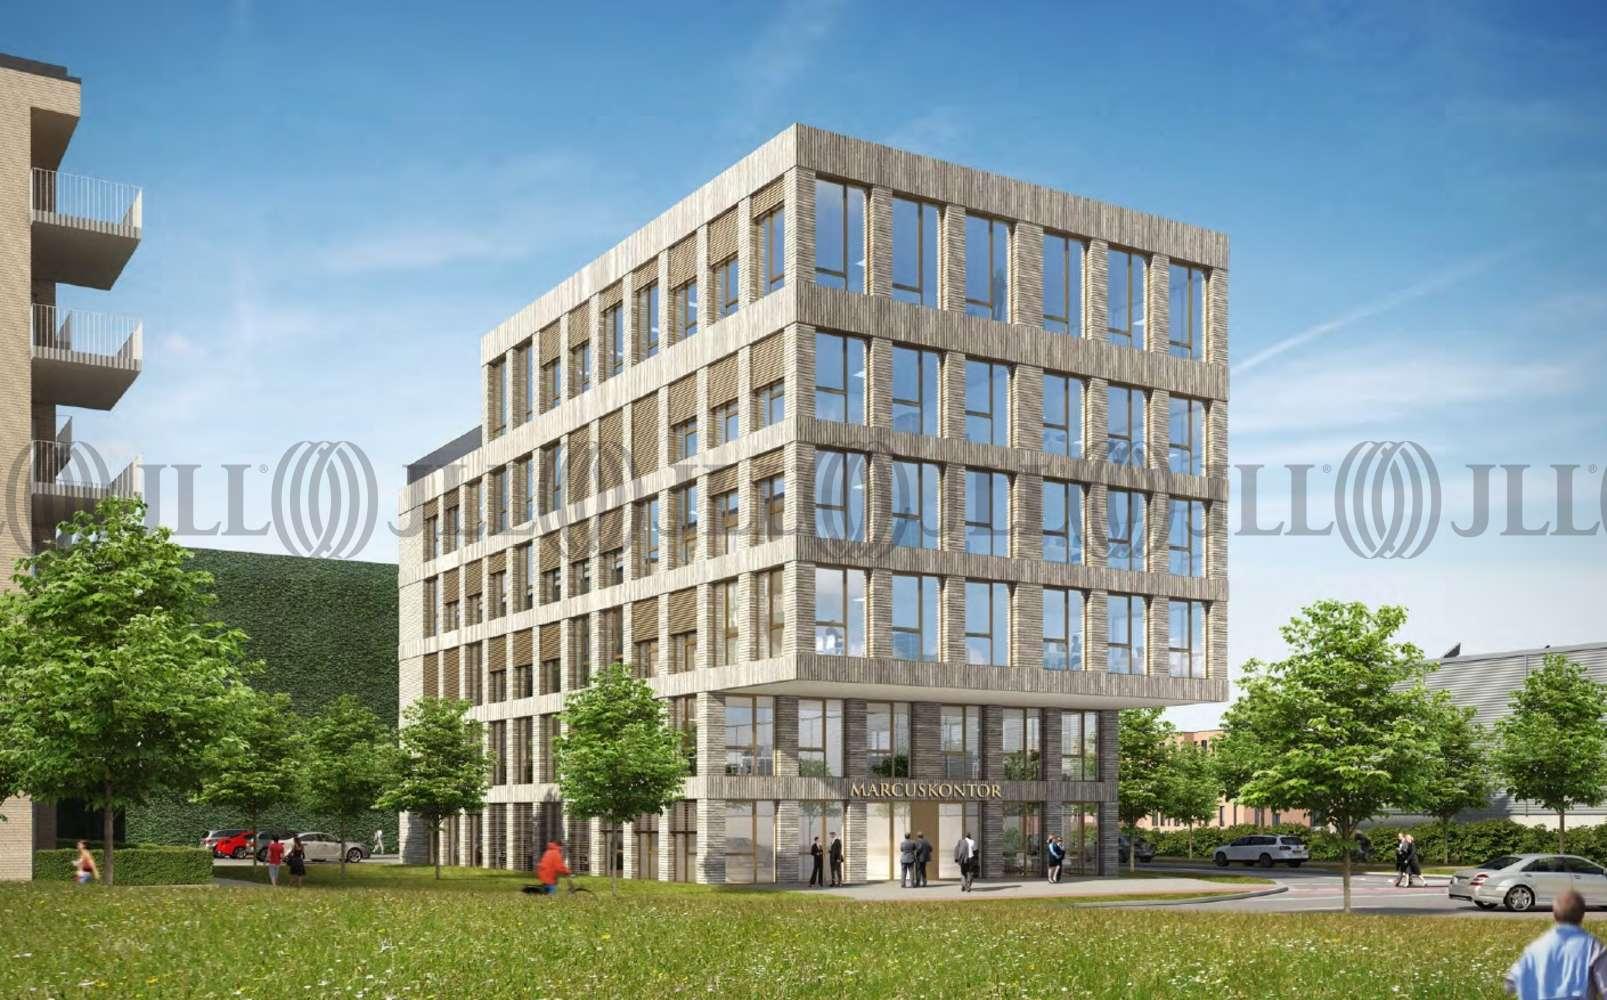 Büros Bremen, 28217 - Büro - Bremen, Handelshäfen - H0967 - 9407506